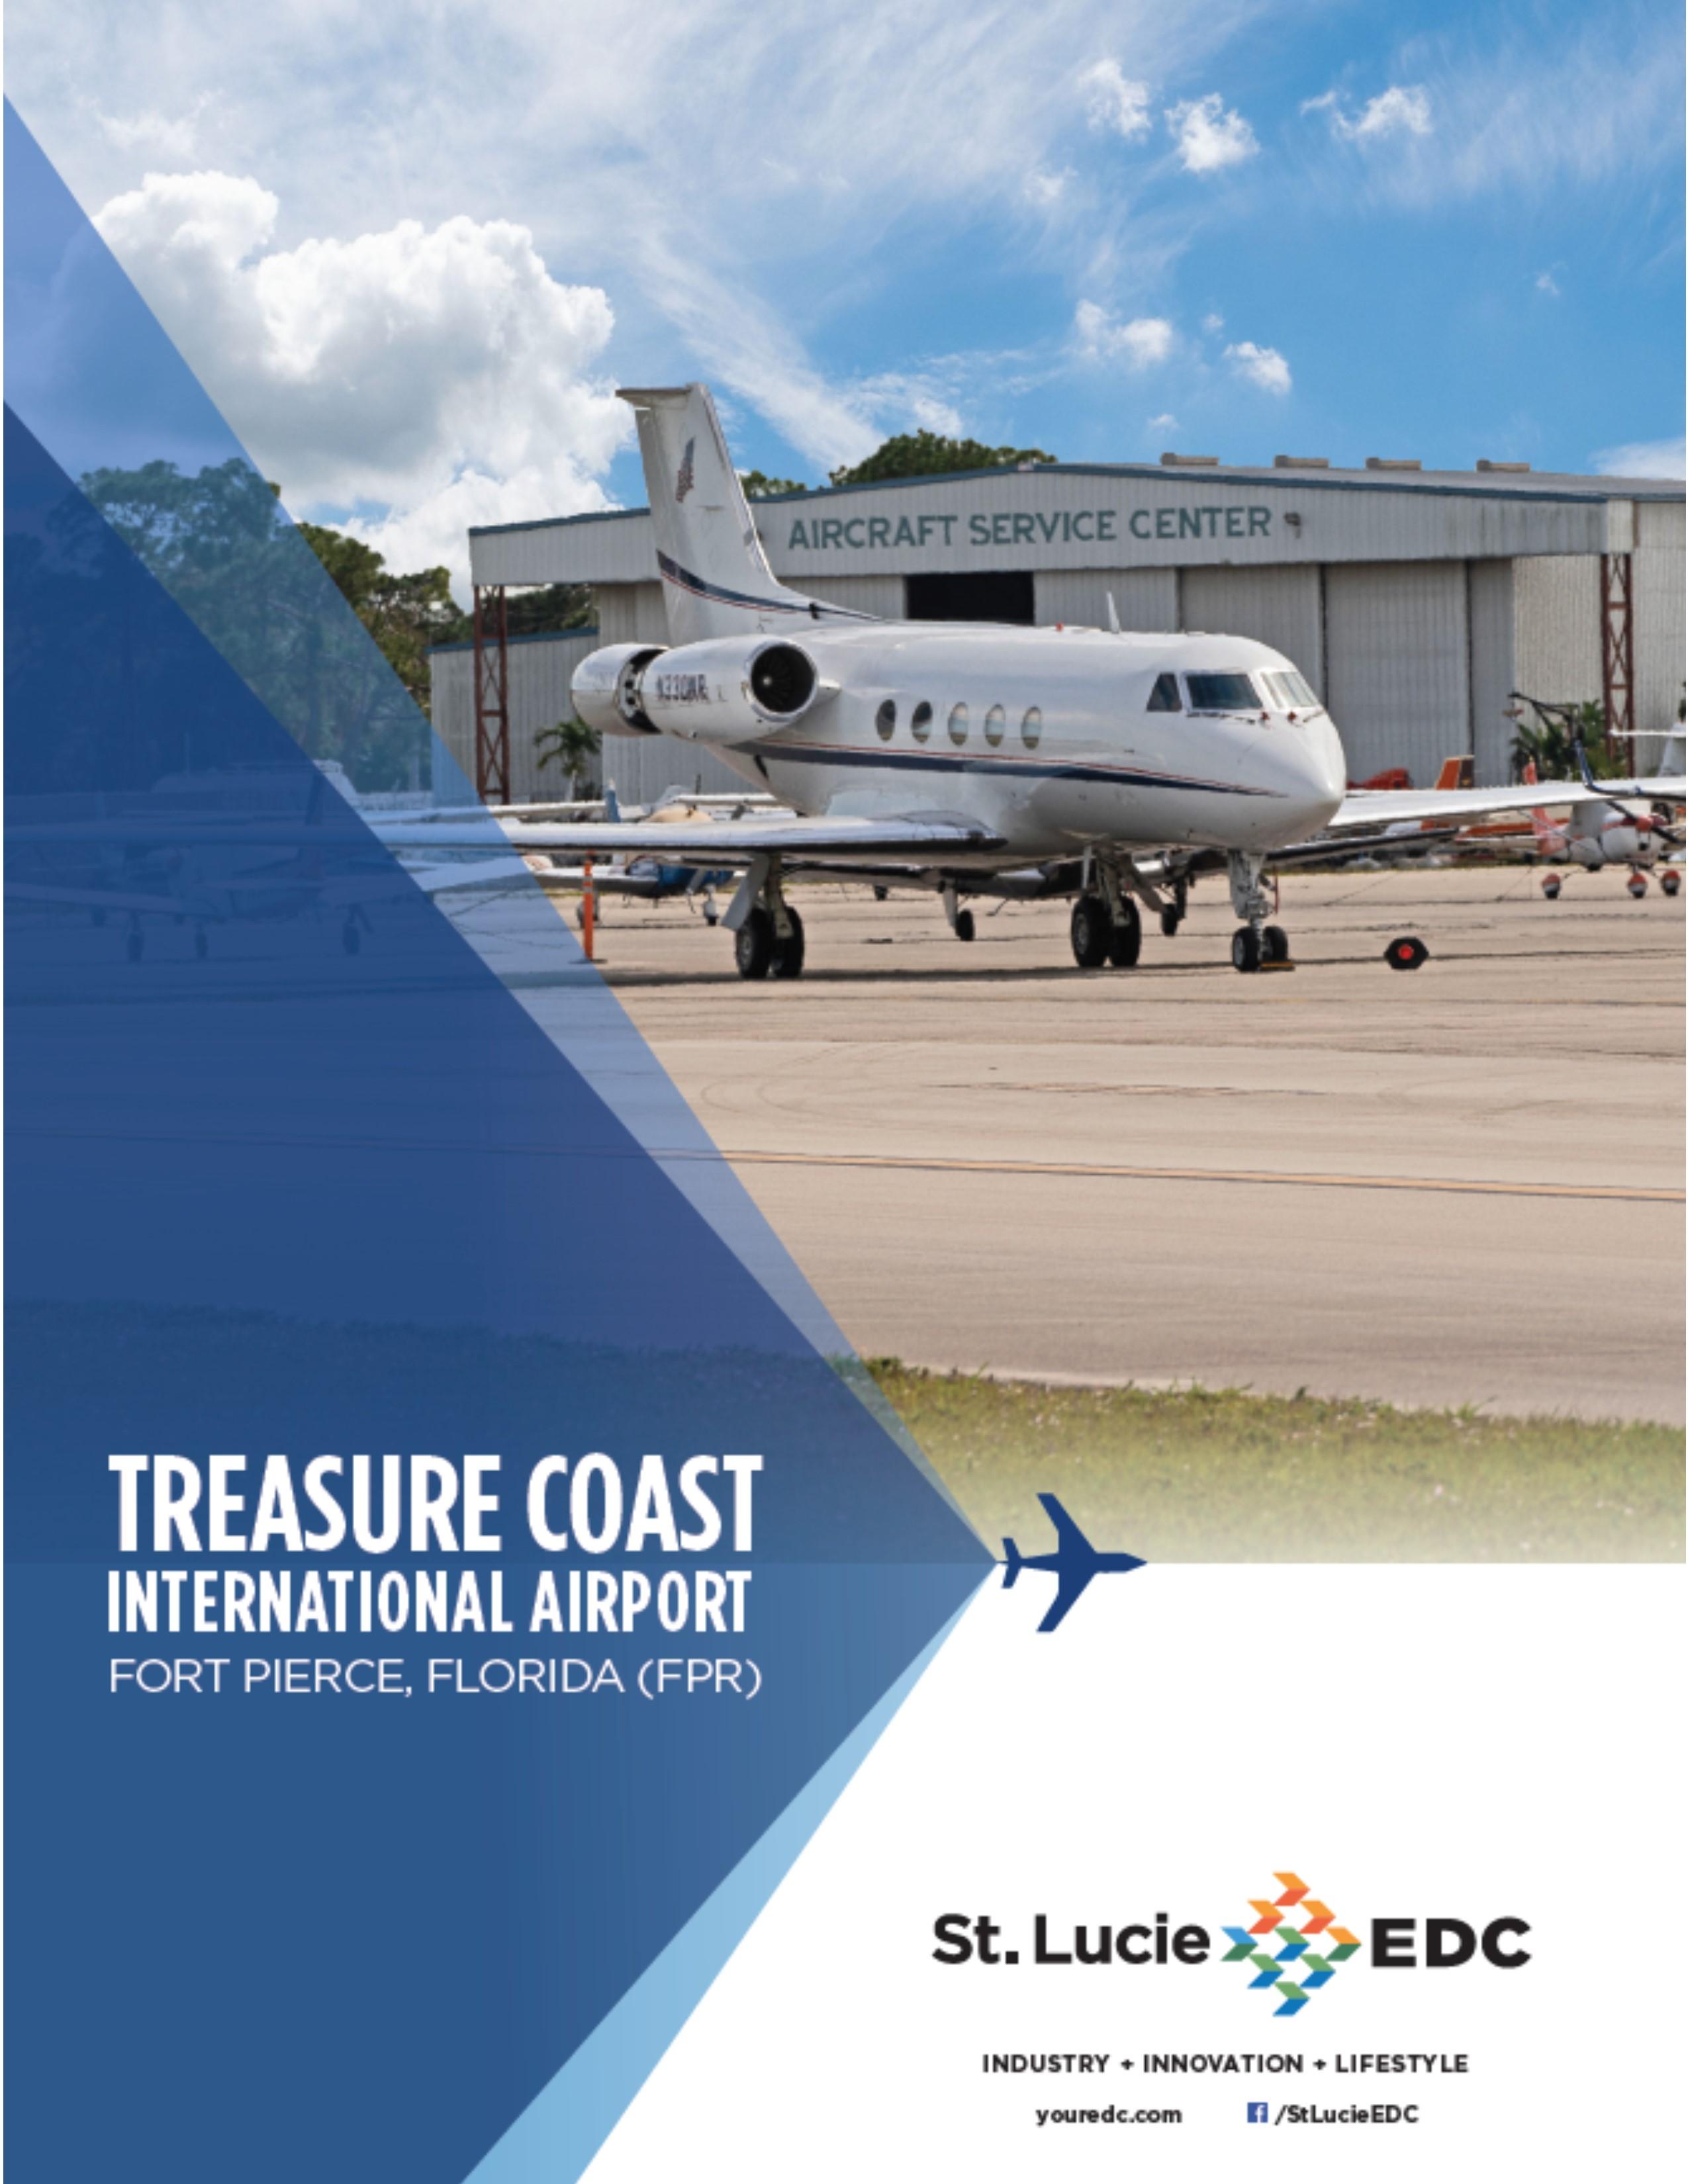 treasure coast international airport - HD2550×3300